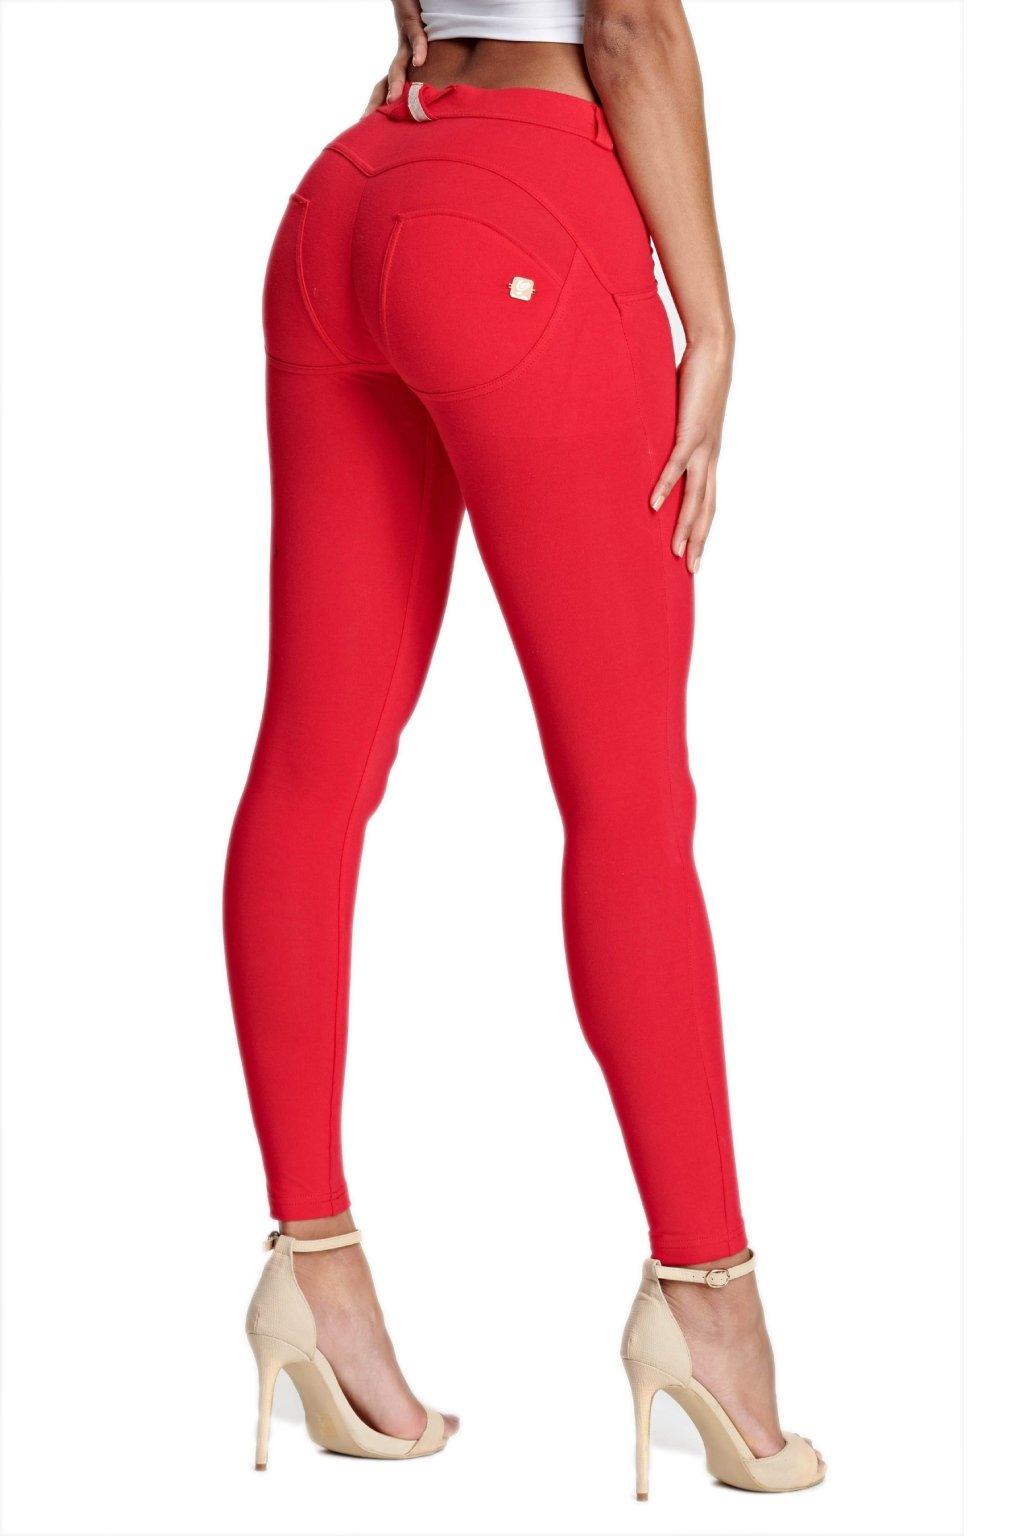 Freddy skinny kalhoty cervene delka po kotniky (1)